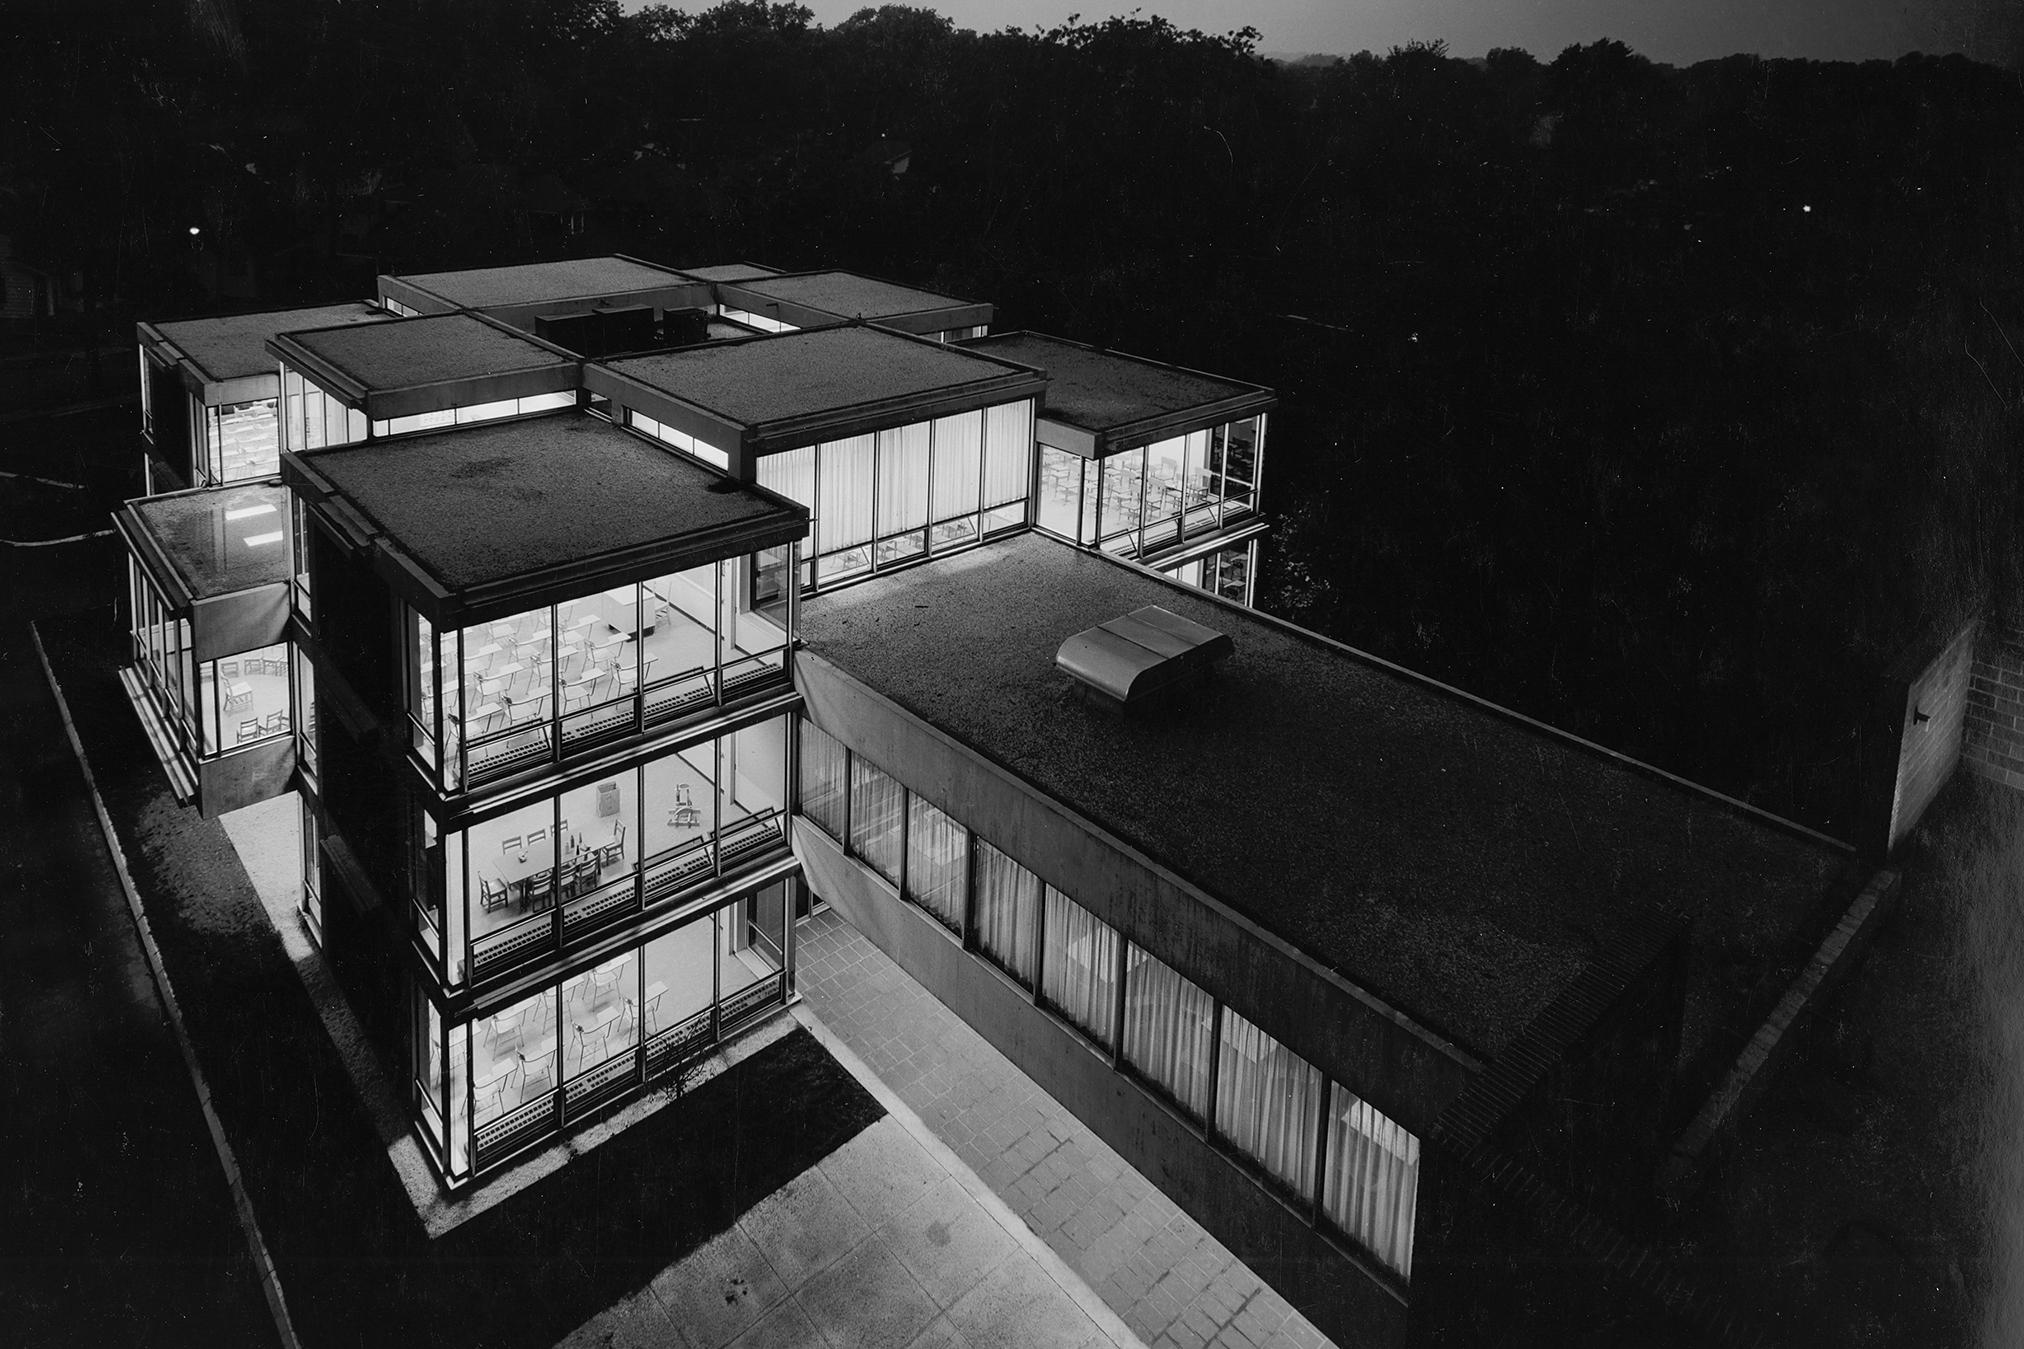 Temple Sharey-Tefilo School (1962)